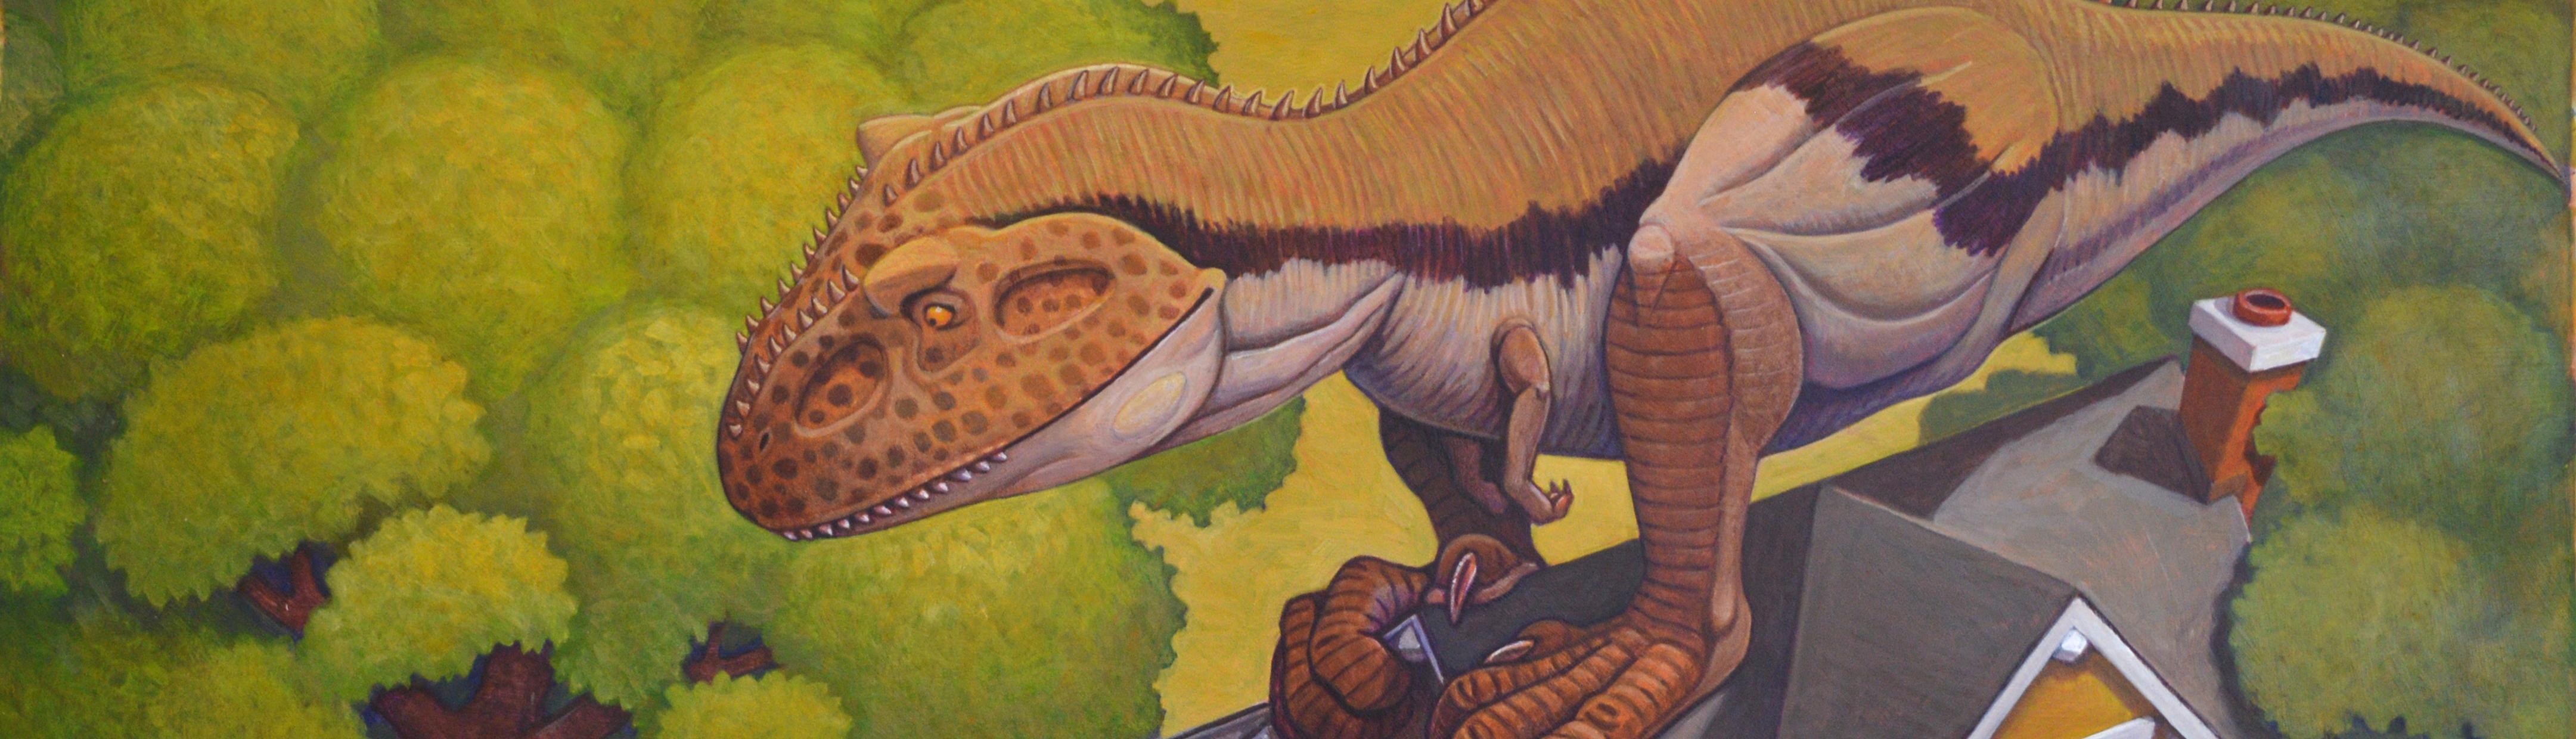 How Do Dinosaurs Stay Safe ∙ Mark Teague ∙ R Michelson